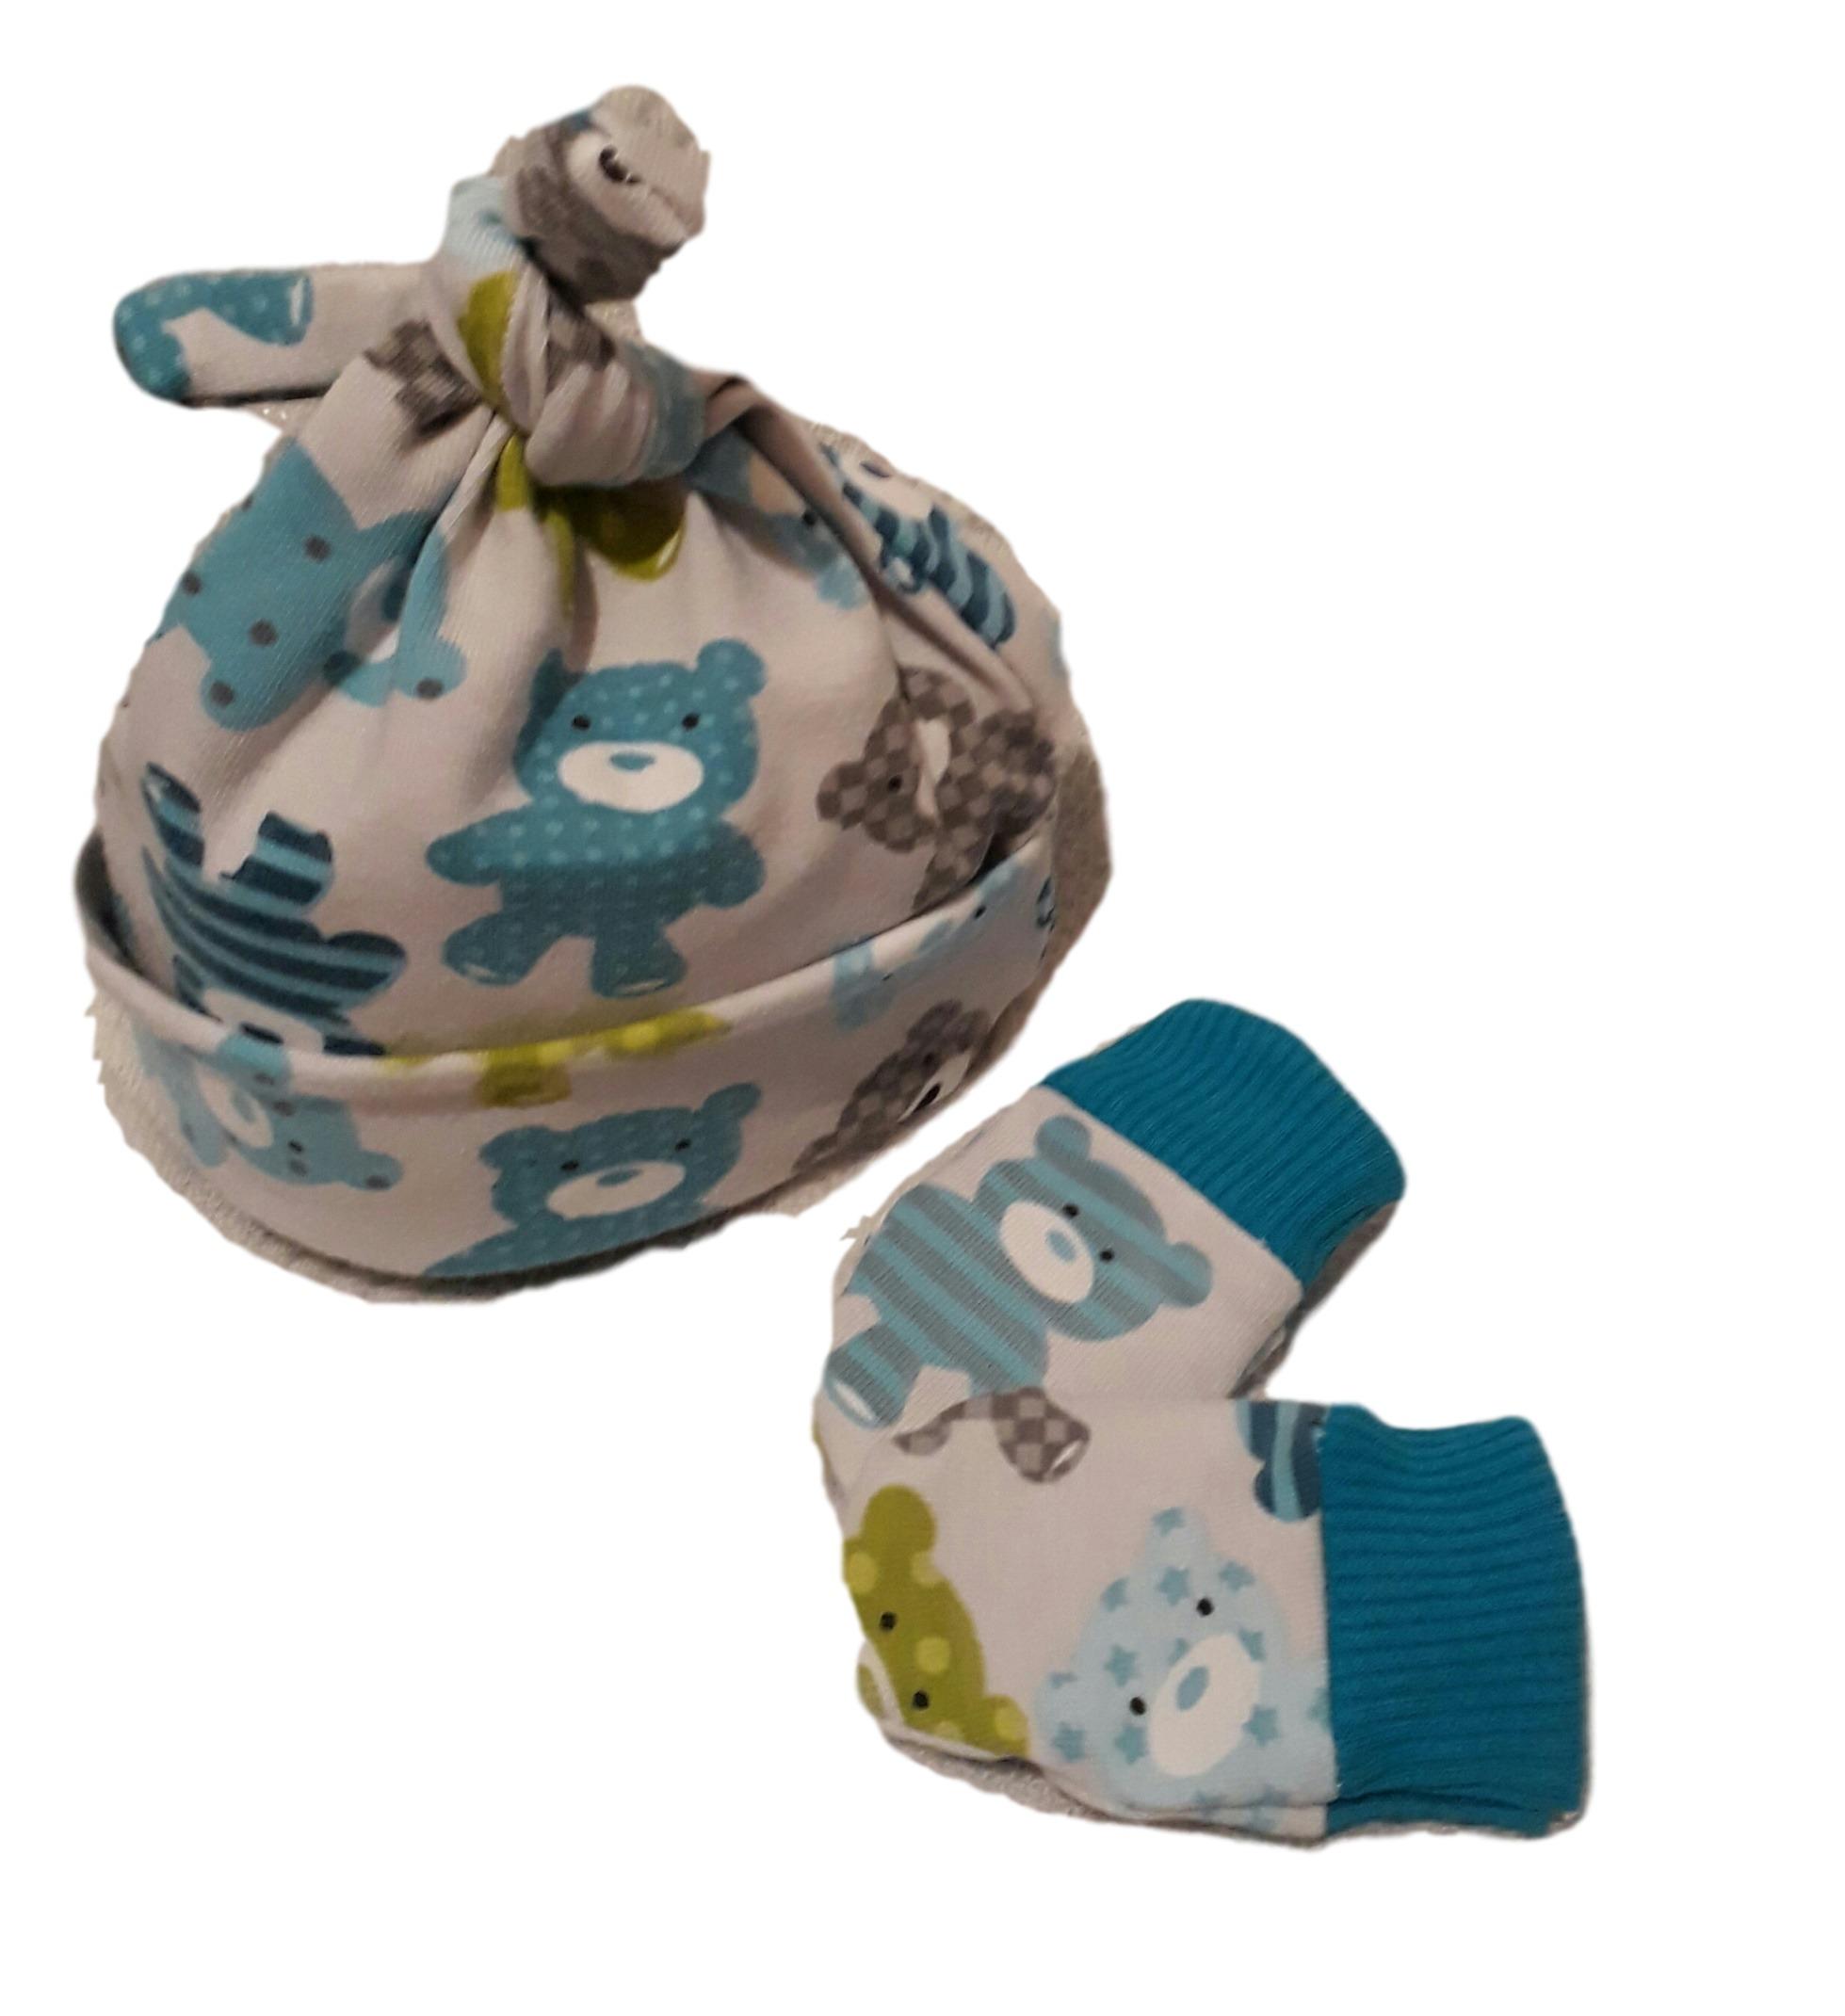 1-2lb tiny babies clothes neonatal hat mittens premature sizesBlue teddies galore